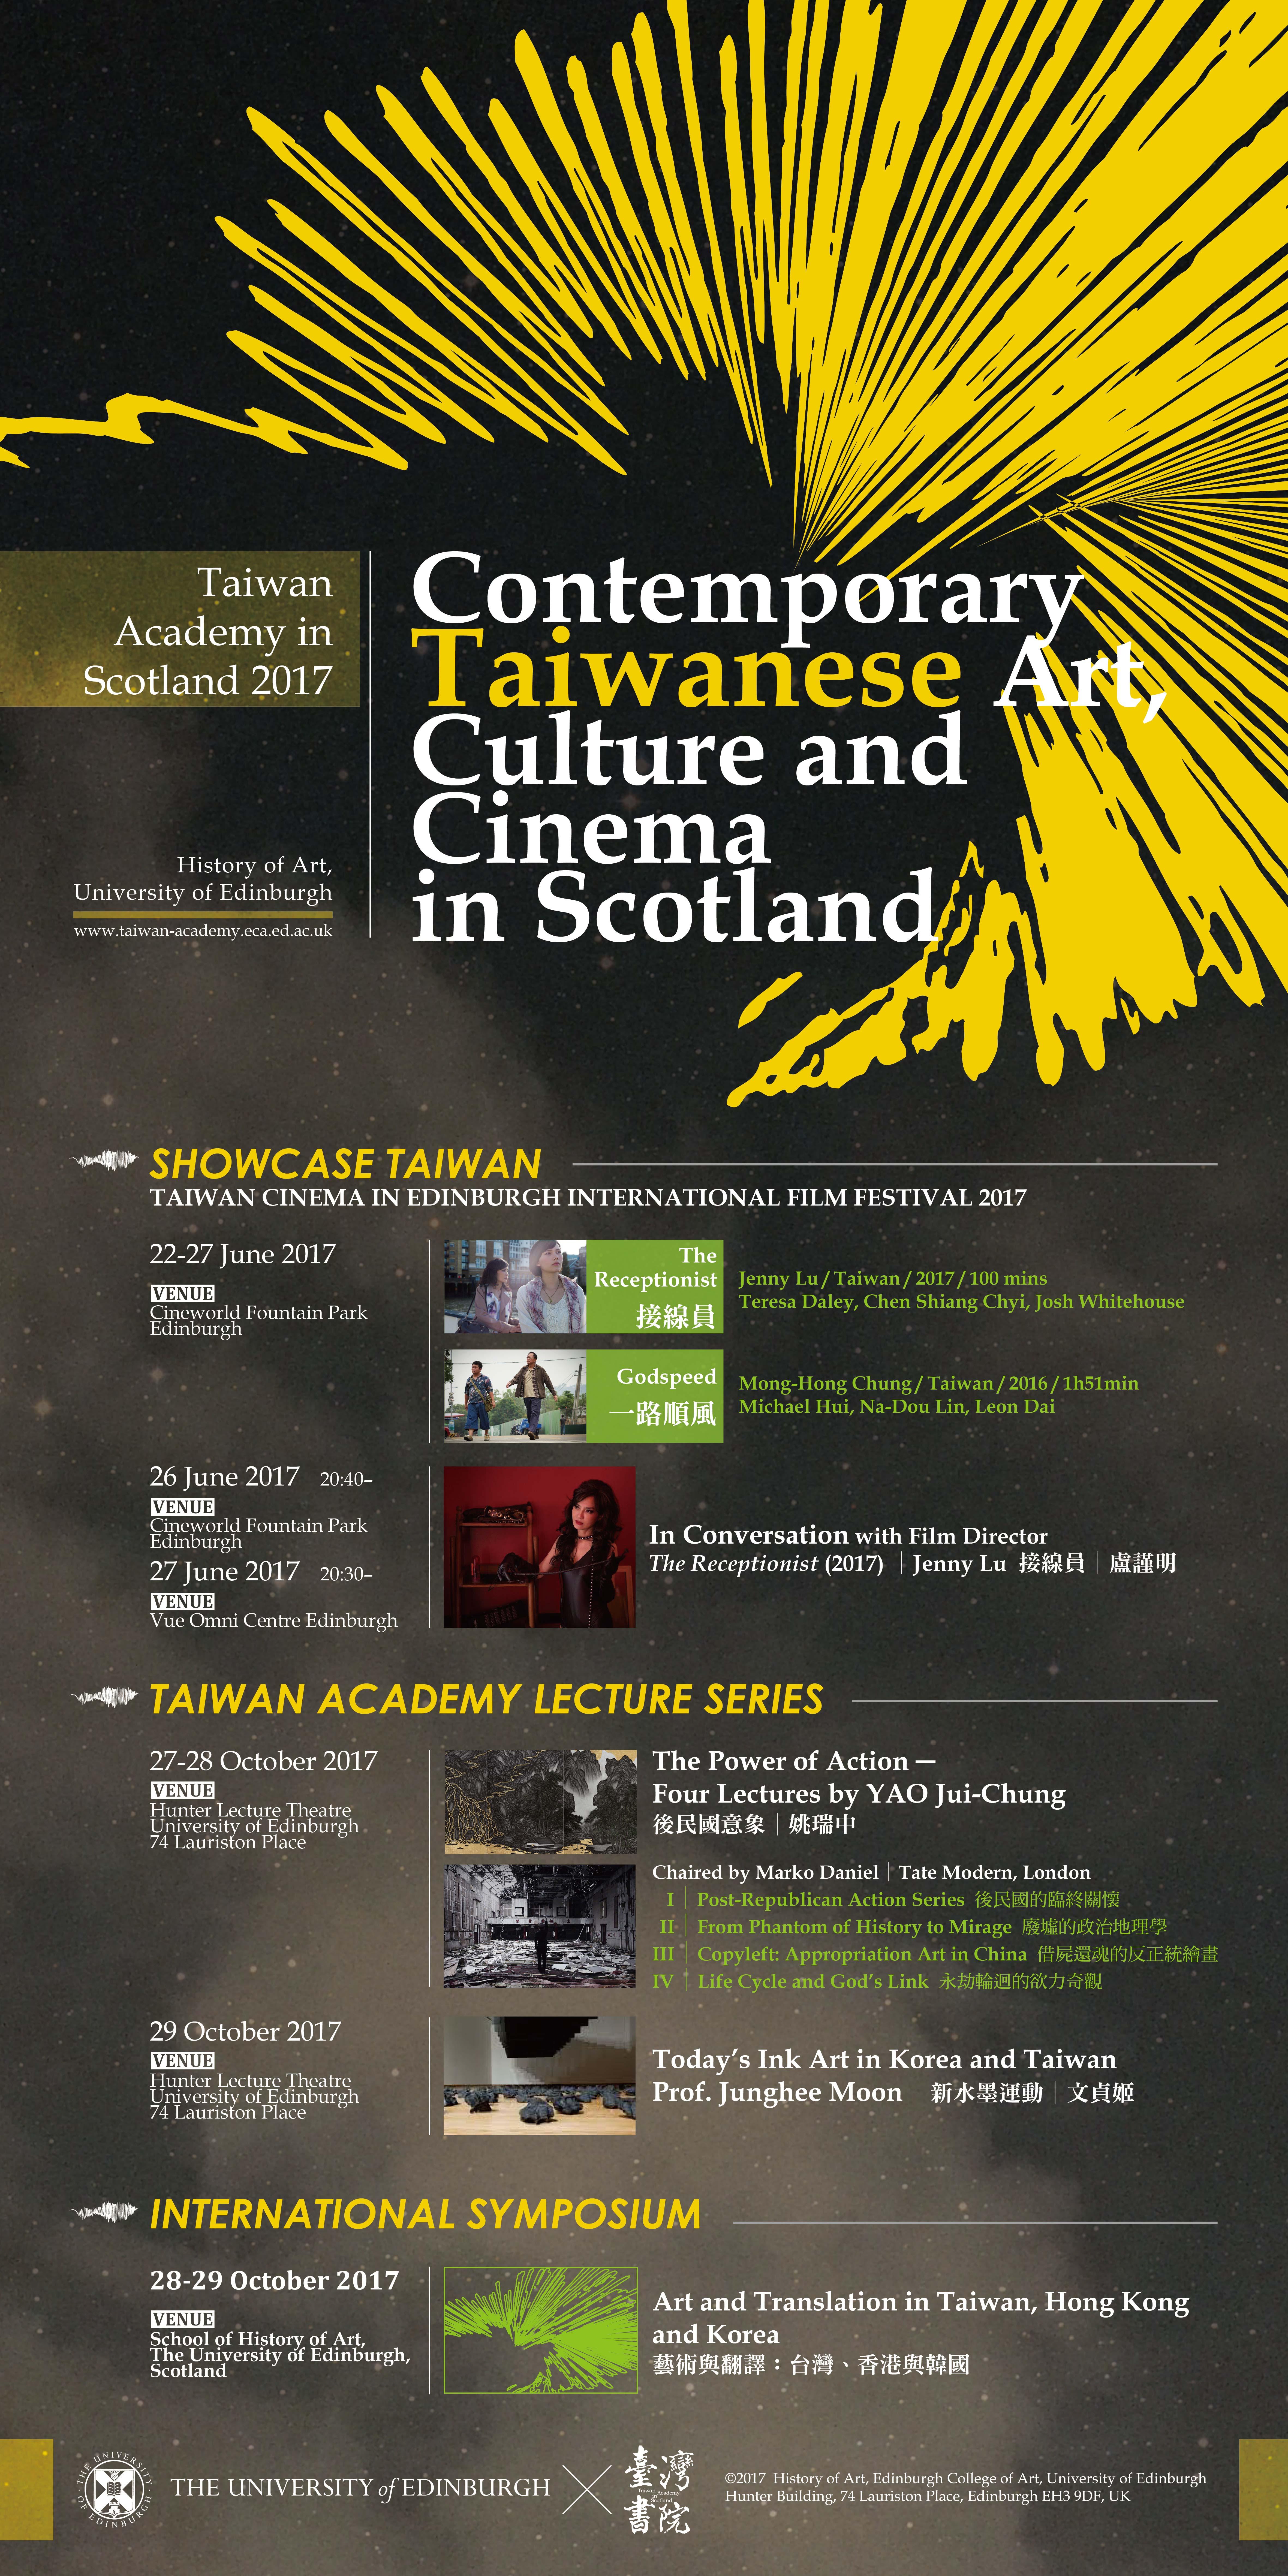 2017 programme poster